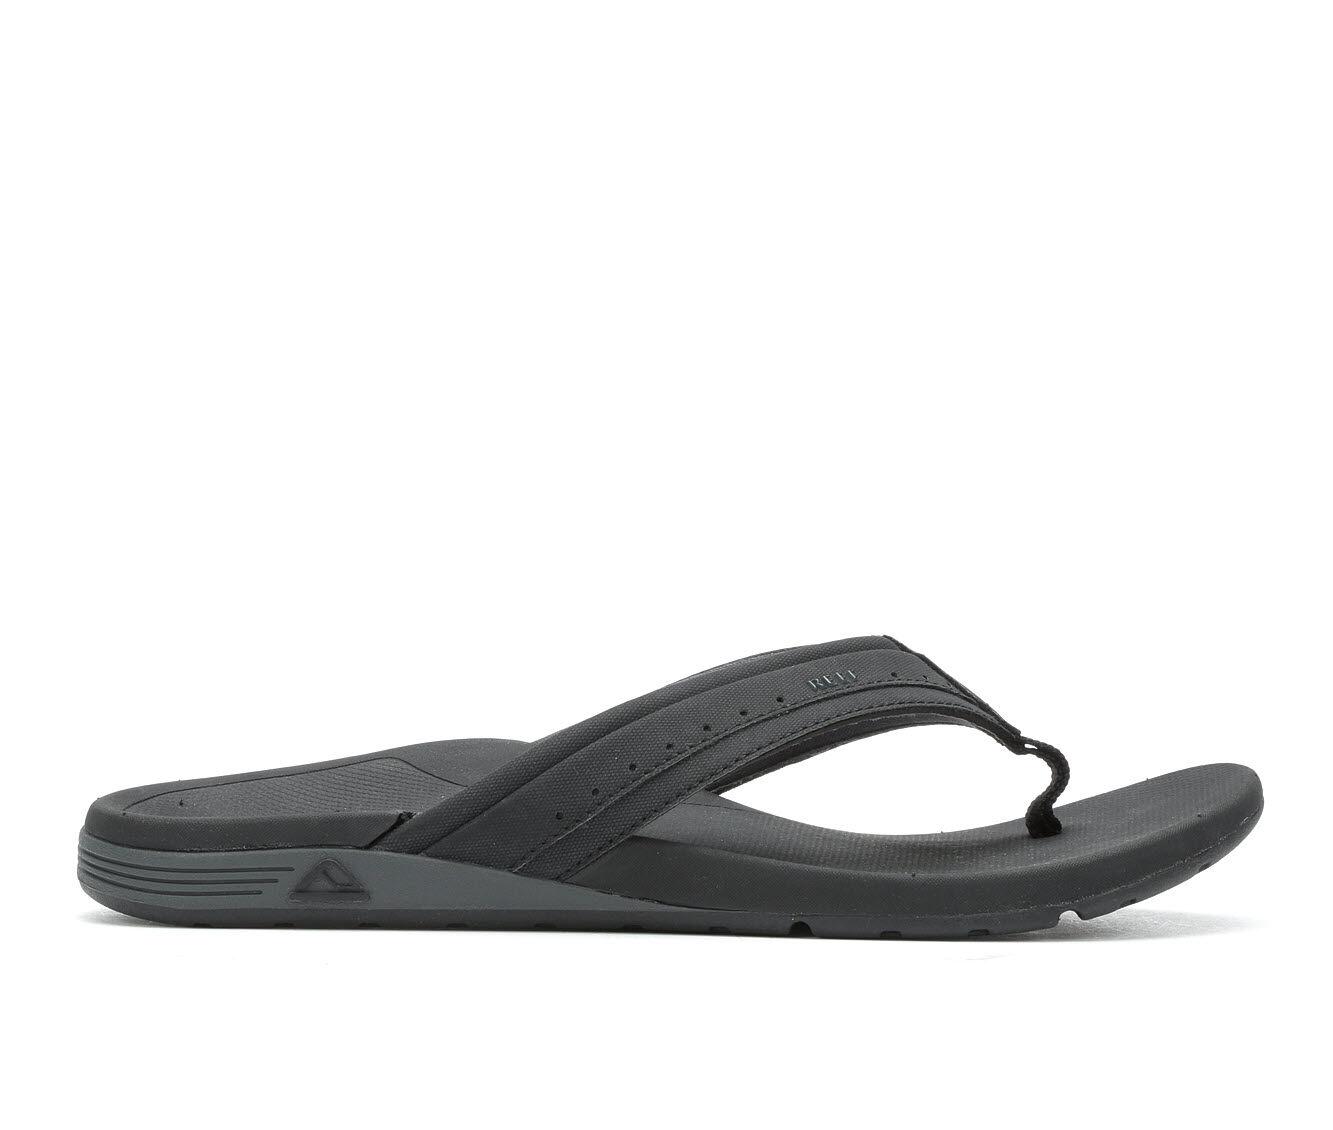 Men's Reef Ortho Spring Flip-Flops Black